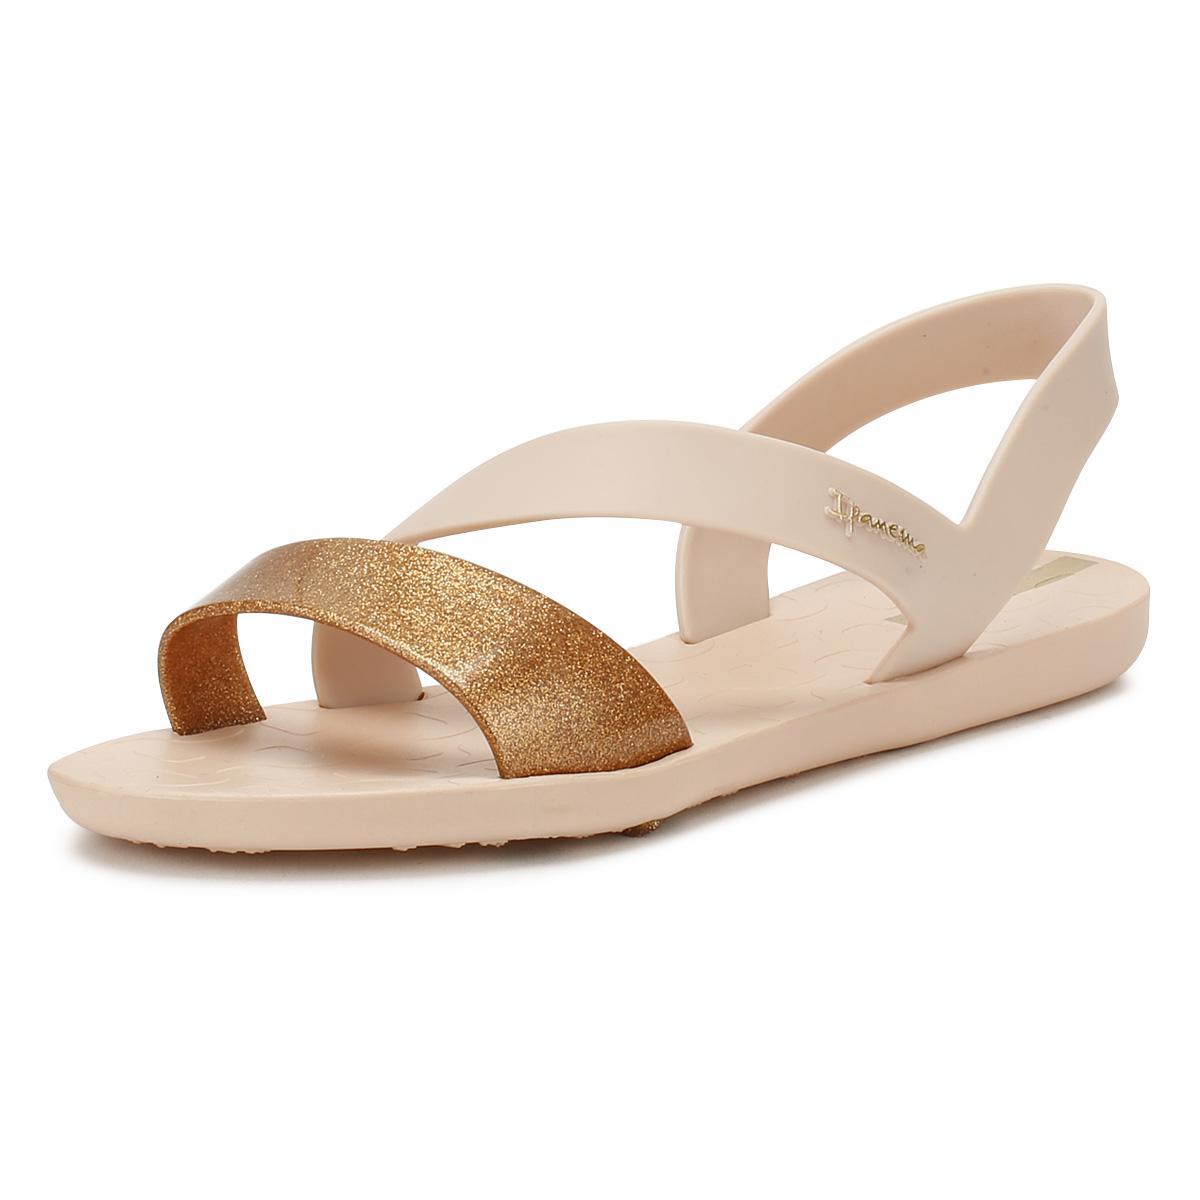 9813ccff62b0 Ipanema Womens Rose Vibe Sandals - Lyst